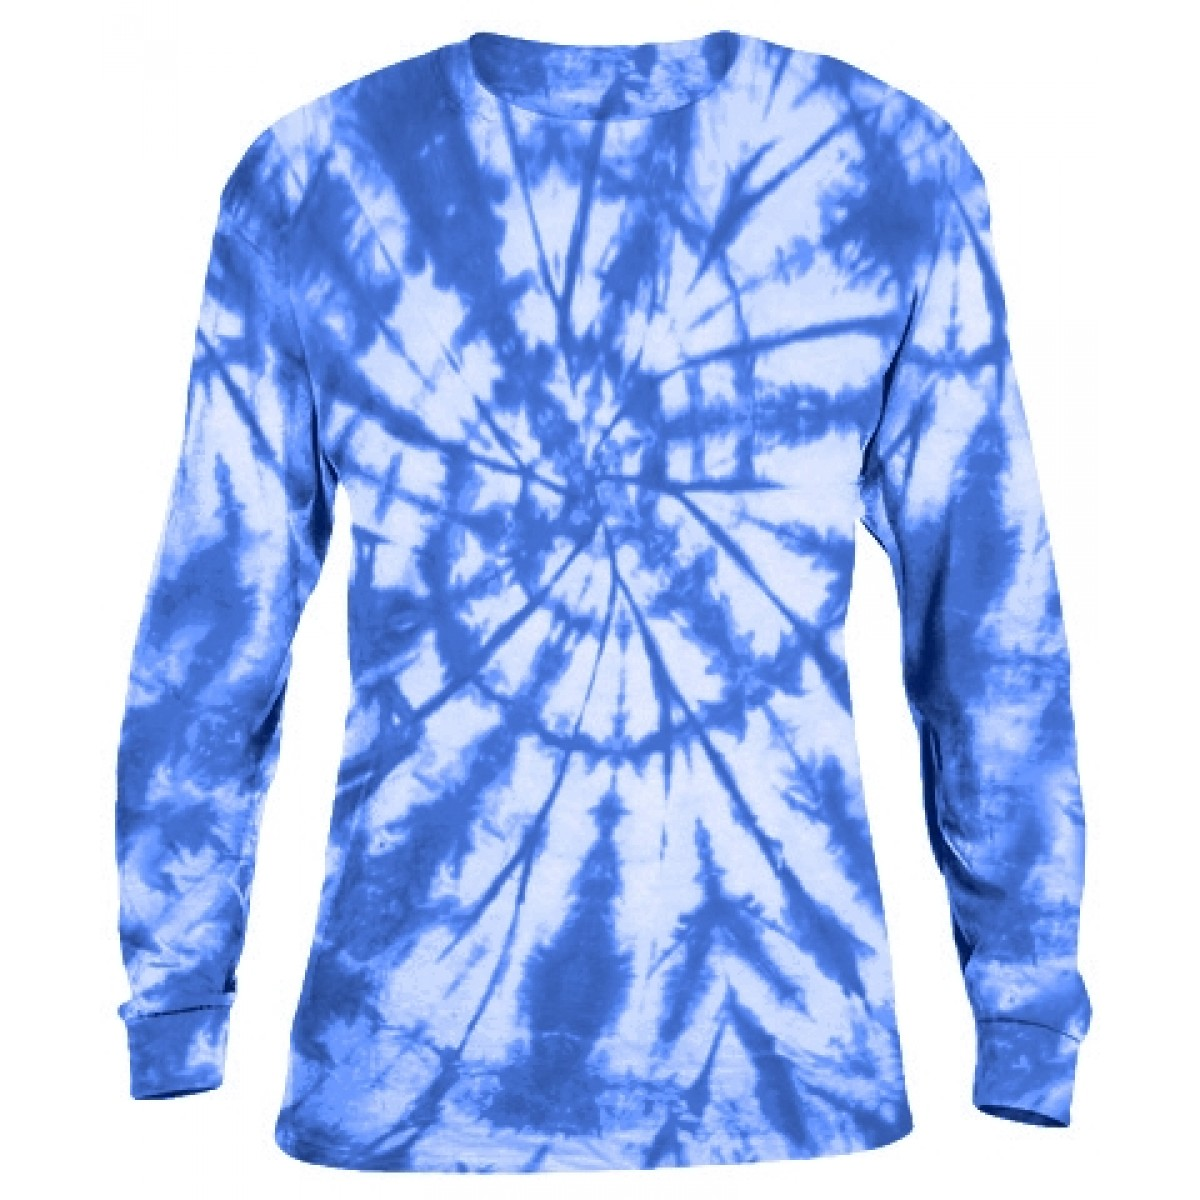 Tie-Dye Long Sleeve Shirt -Blue-M